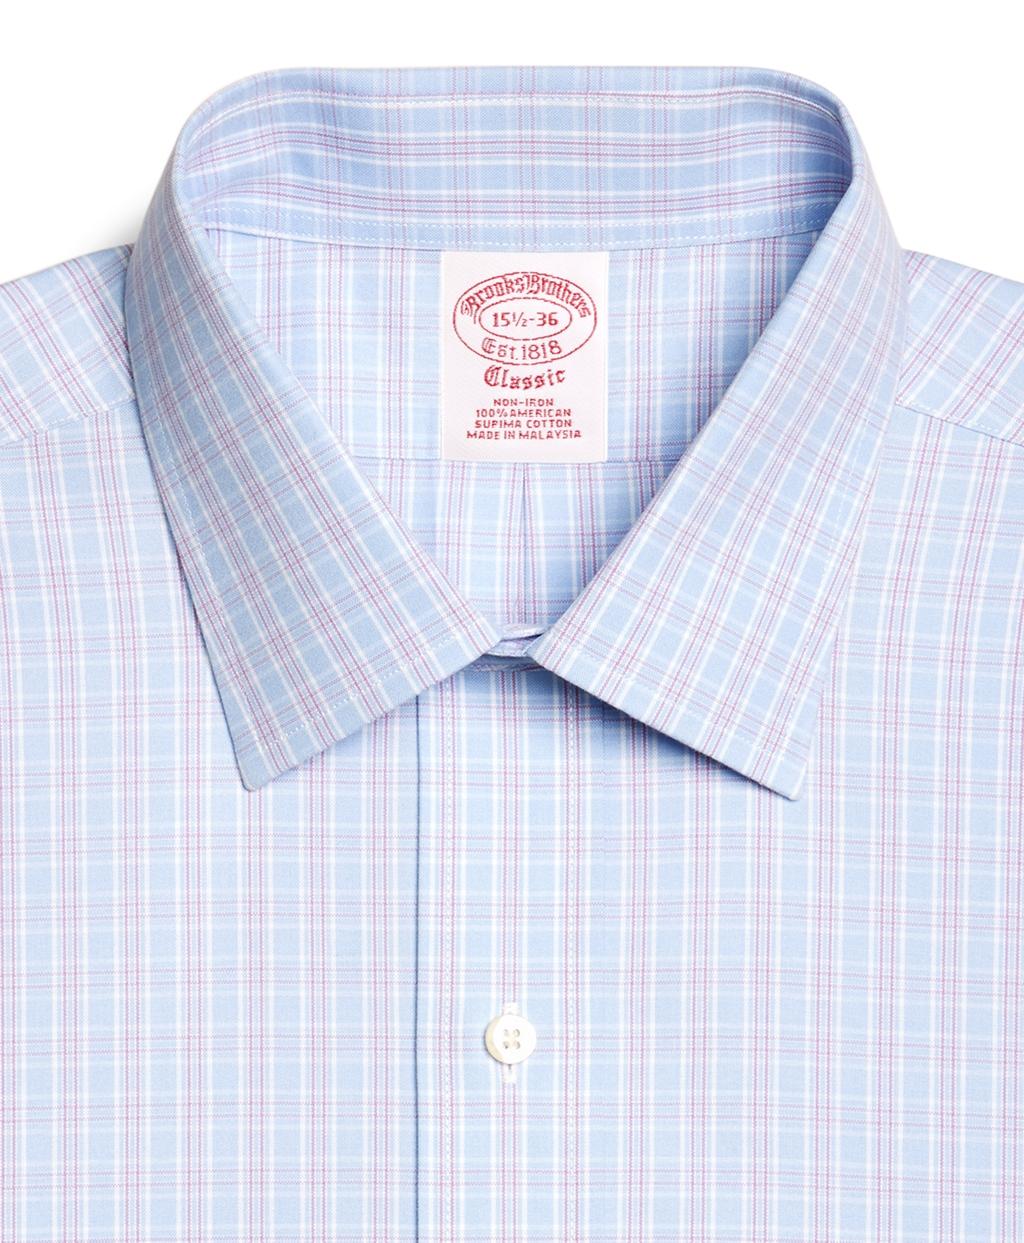 Brooks Brothers Supima Cotton Noniron Regular Fit Spread